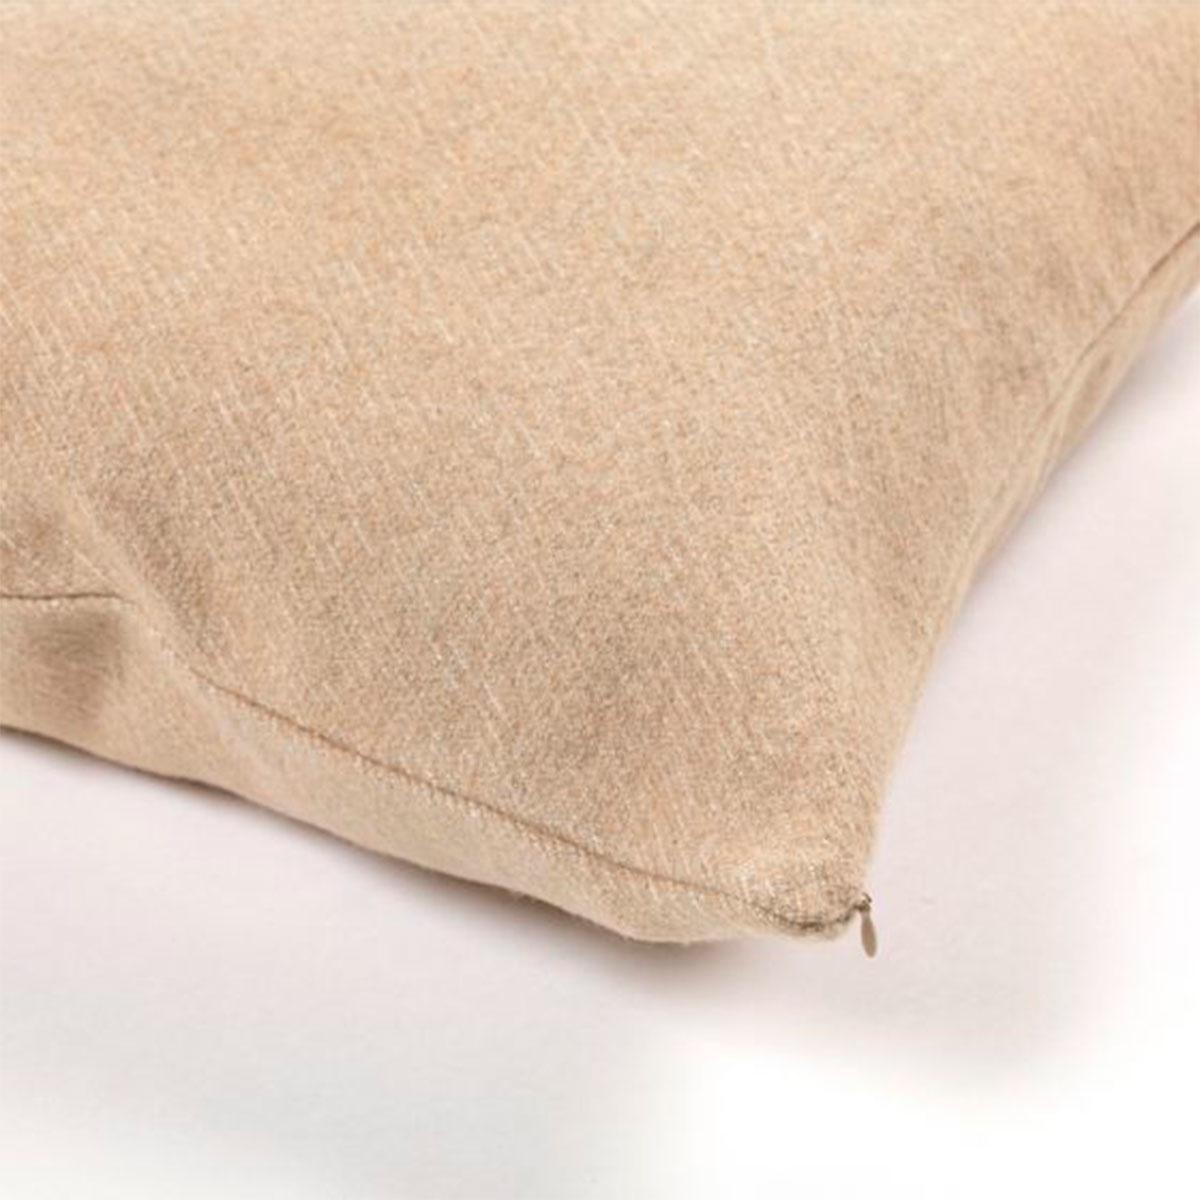 Cushion Cover - Shetland - Camel  - Set of 3-2